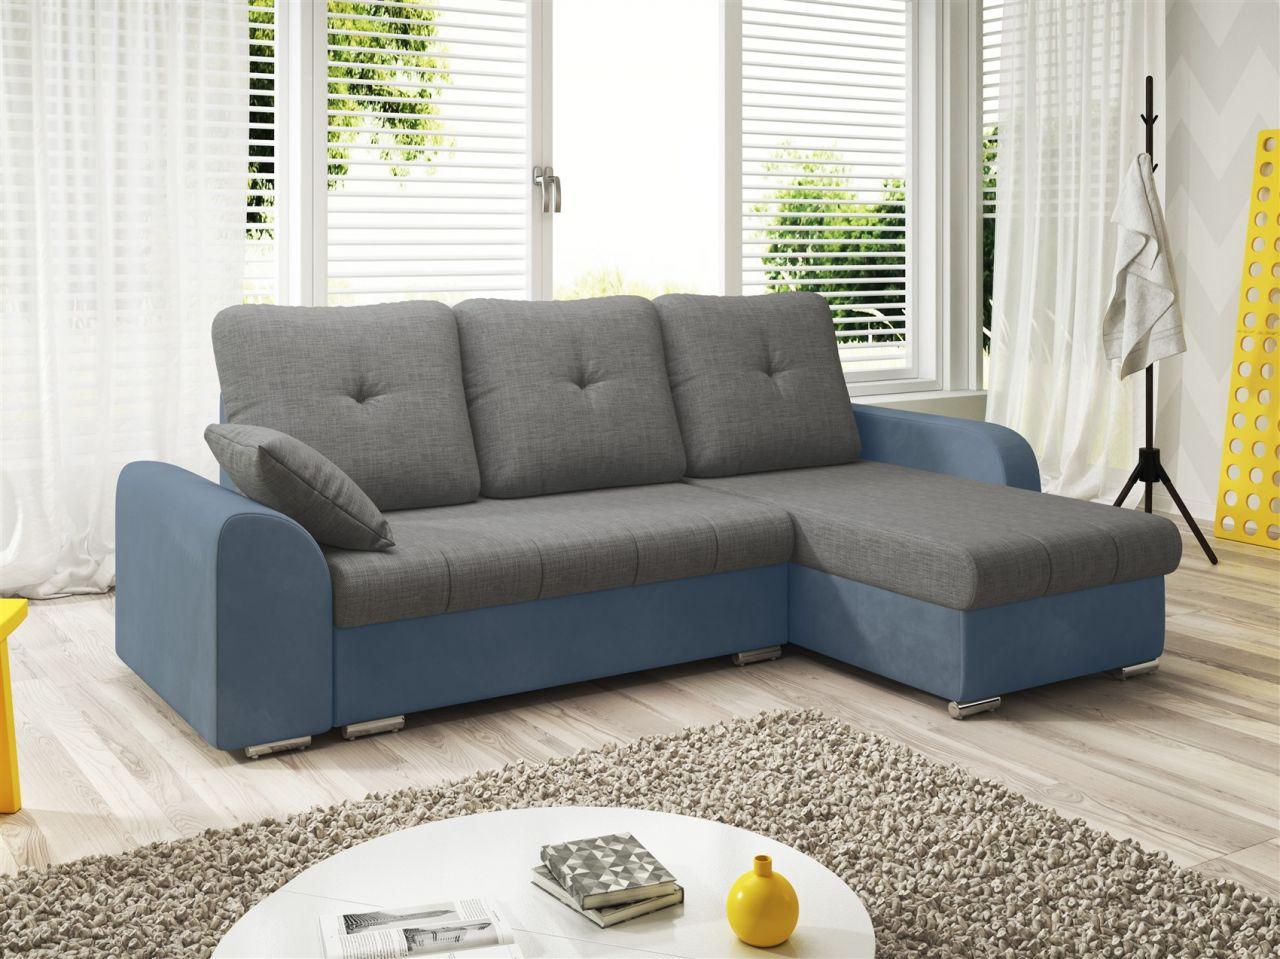 ecksofa sofa dekos mit schlaffunktion hellblau grau. Black Bedroom Furniture Sets. Home Design Ideas